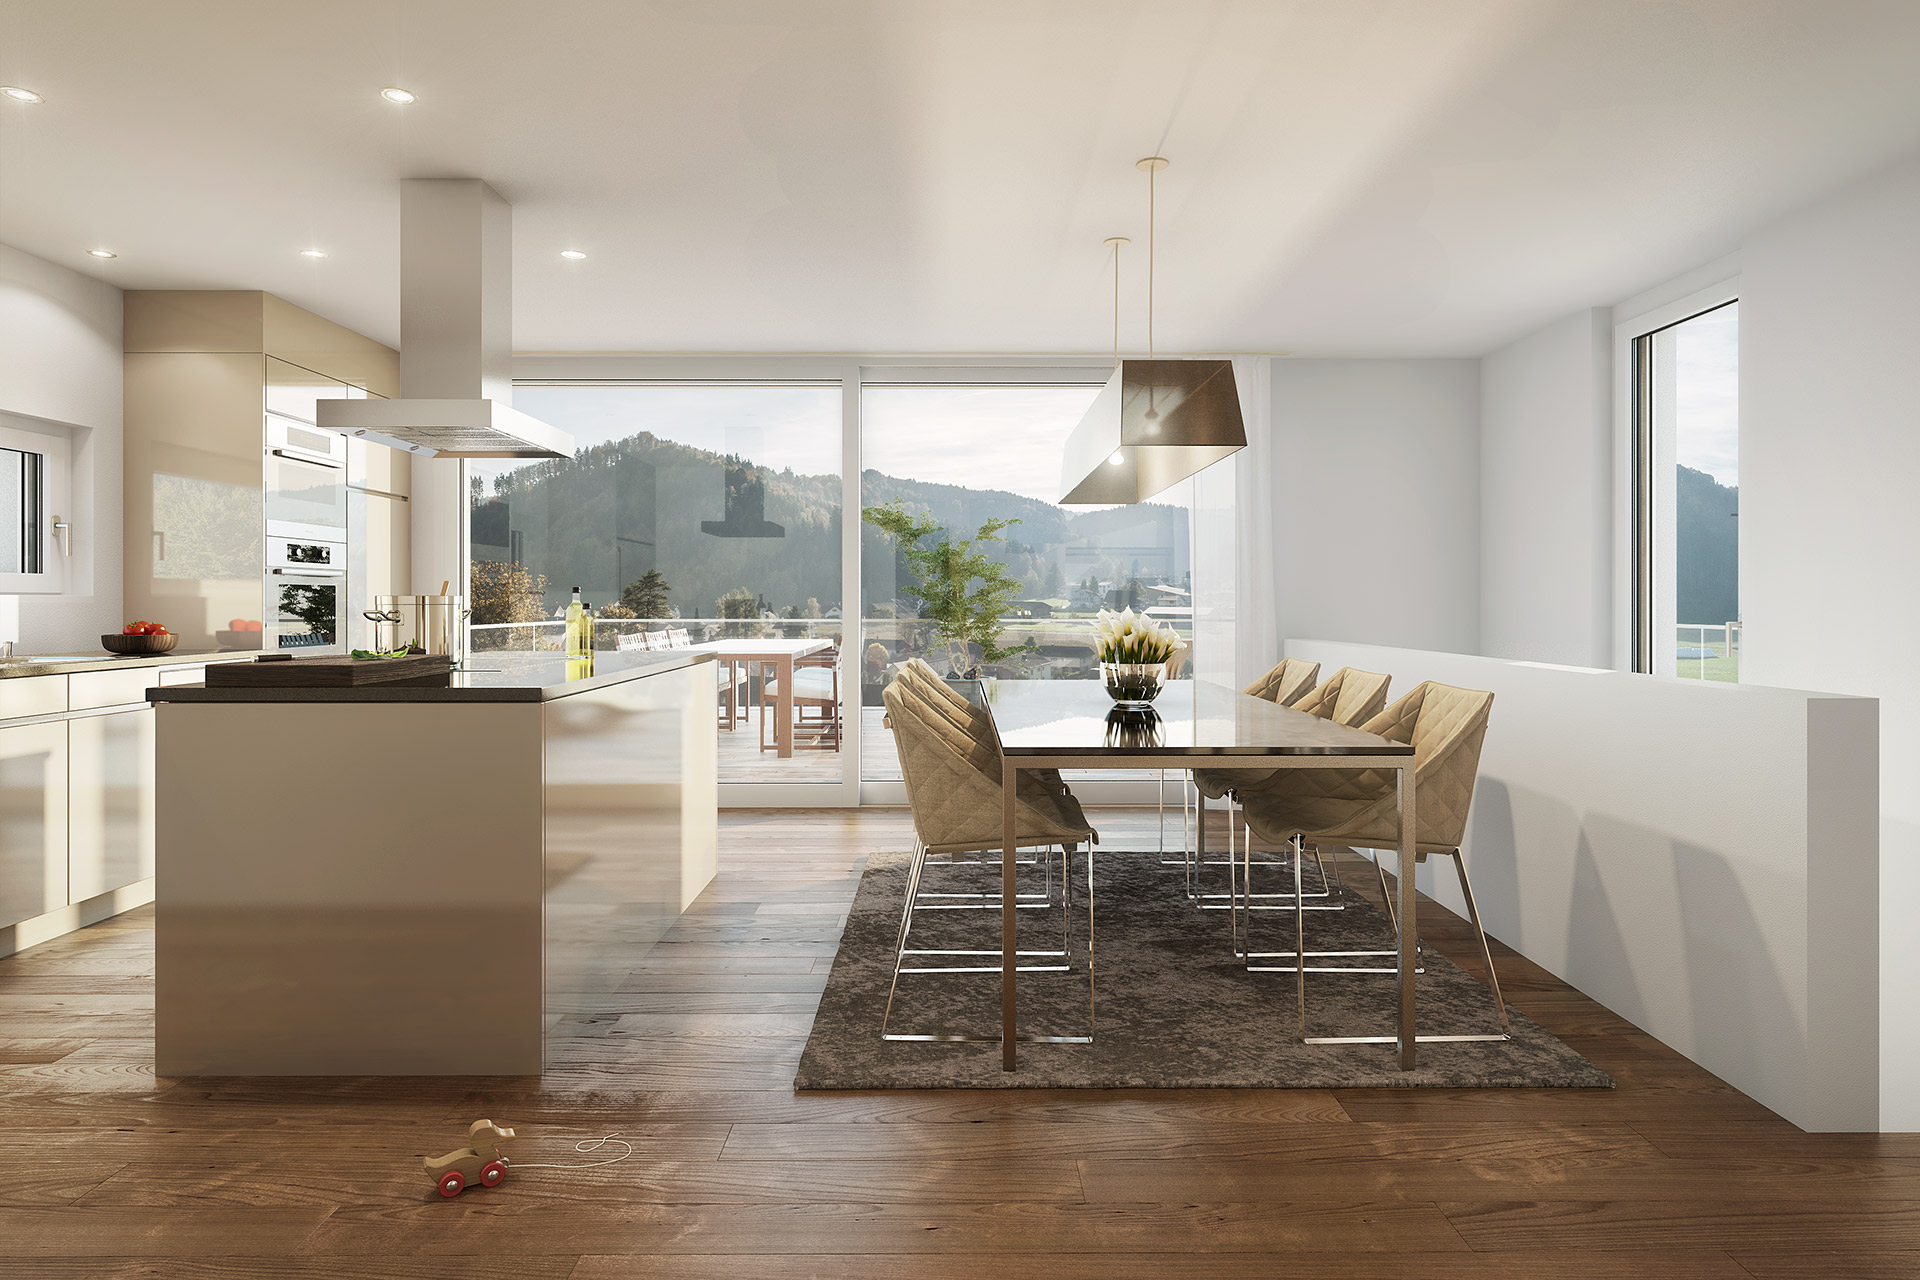 «Sunnehügel» Dussnang – Küche Essen Terrasse